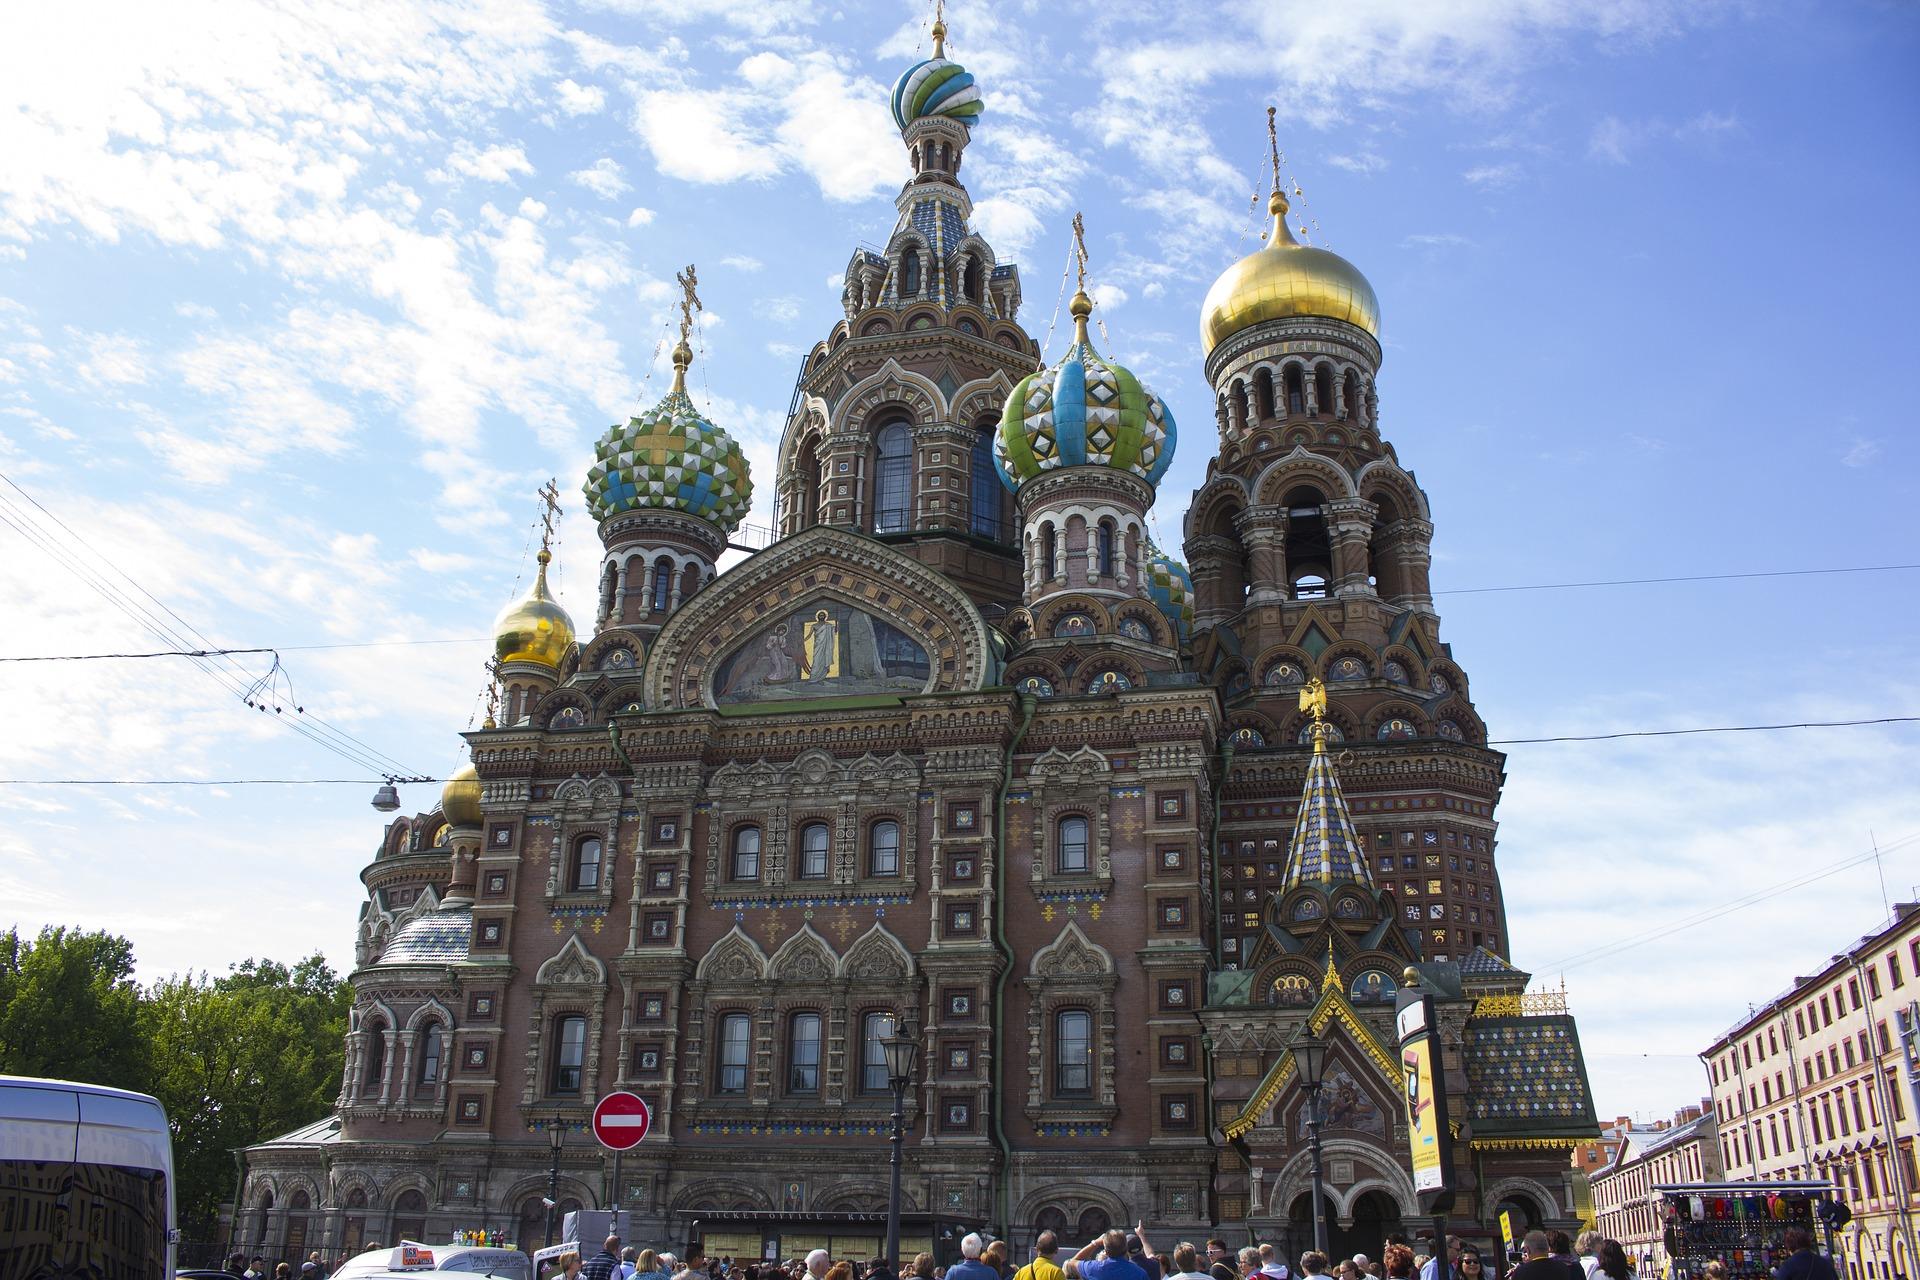 St. Petersburg mit dem Hop on Hop off Bus